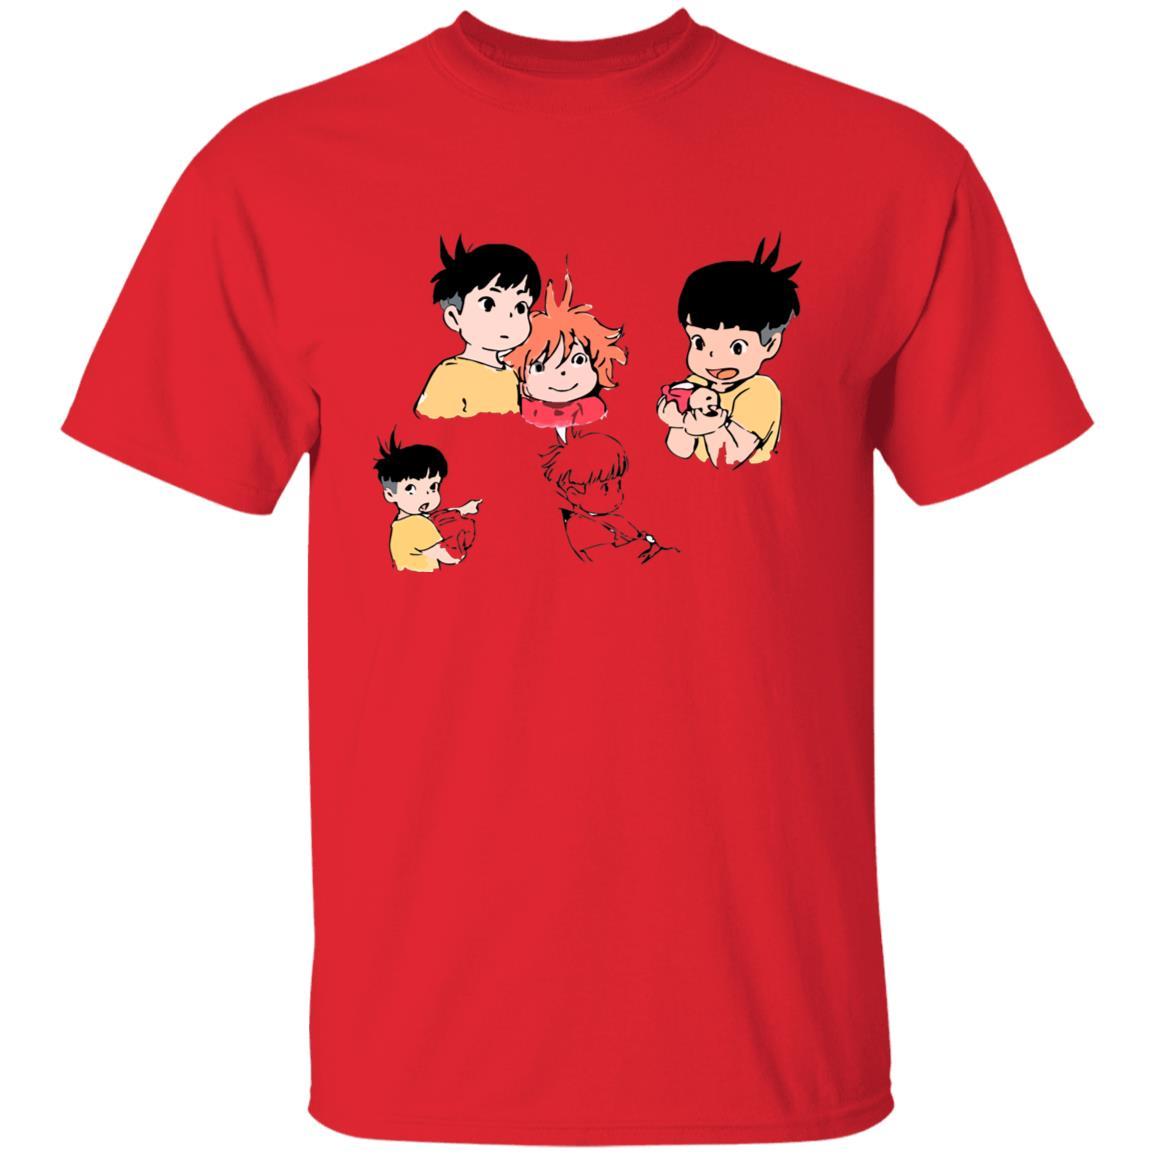 Ponyo and Sosuke Sketch T Shirt